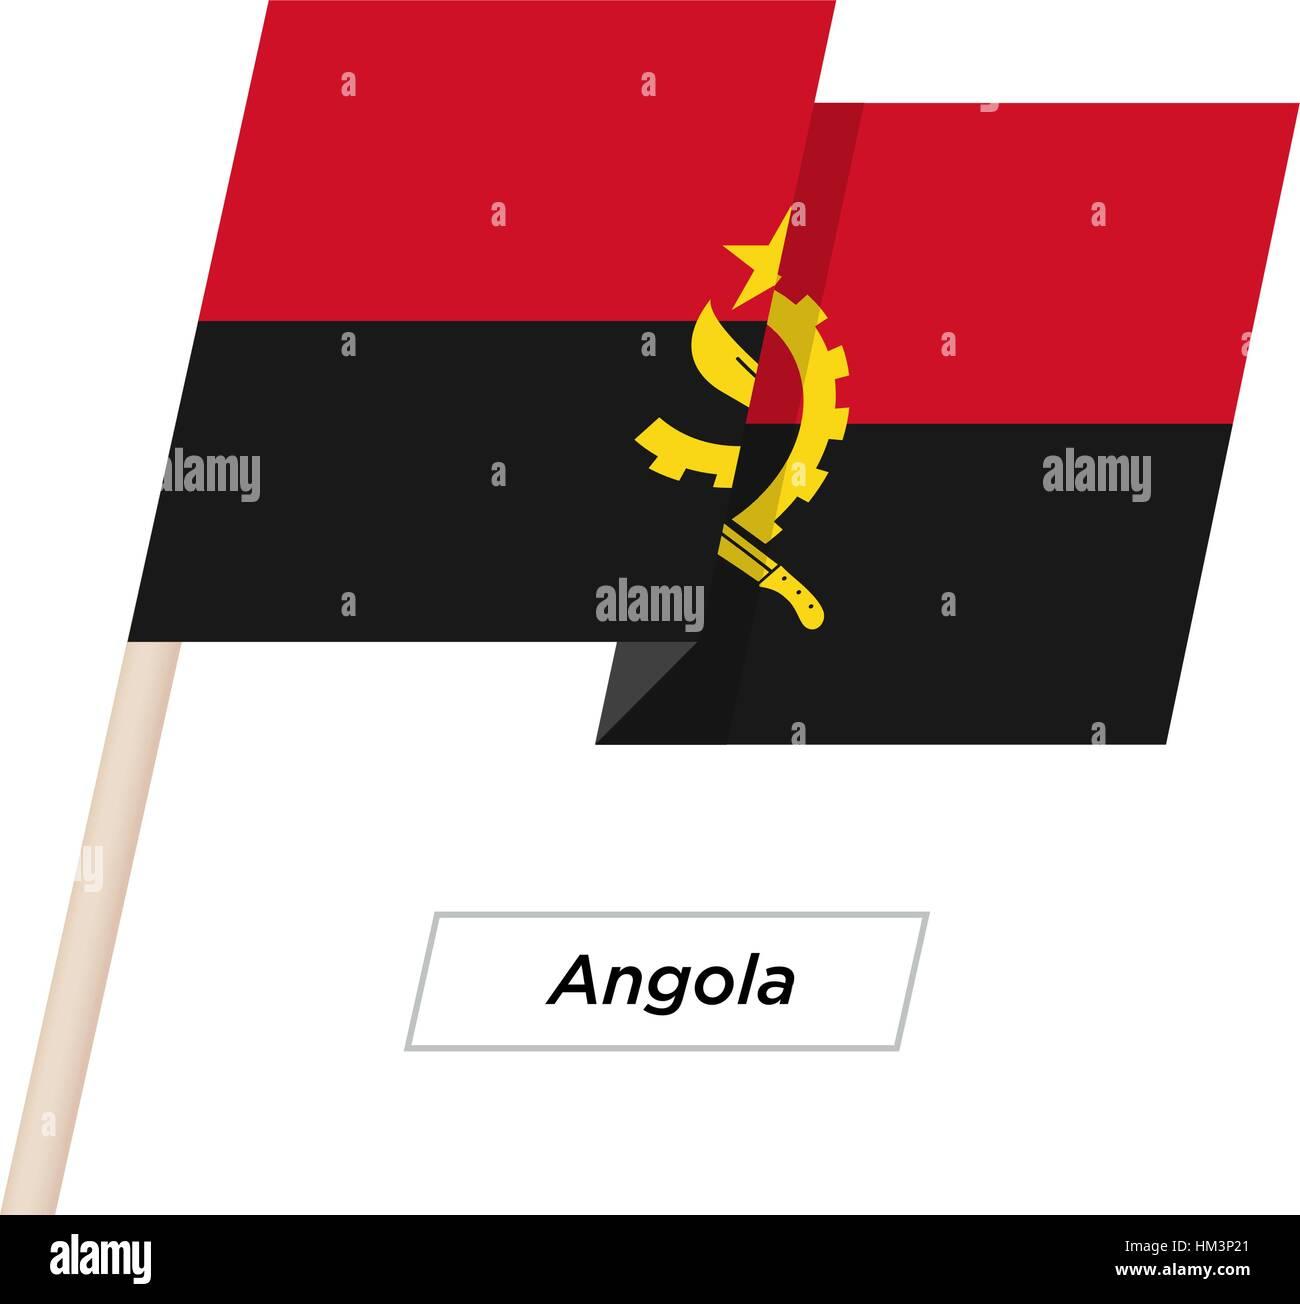 Angola Ribbon Waving Flag Isolated on White. Vector Illustration. - Stock Vector